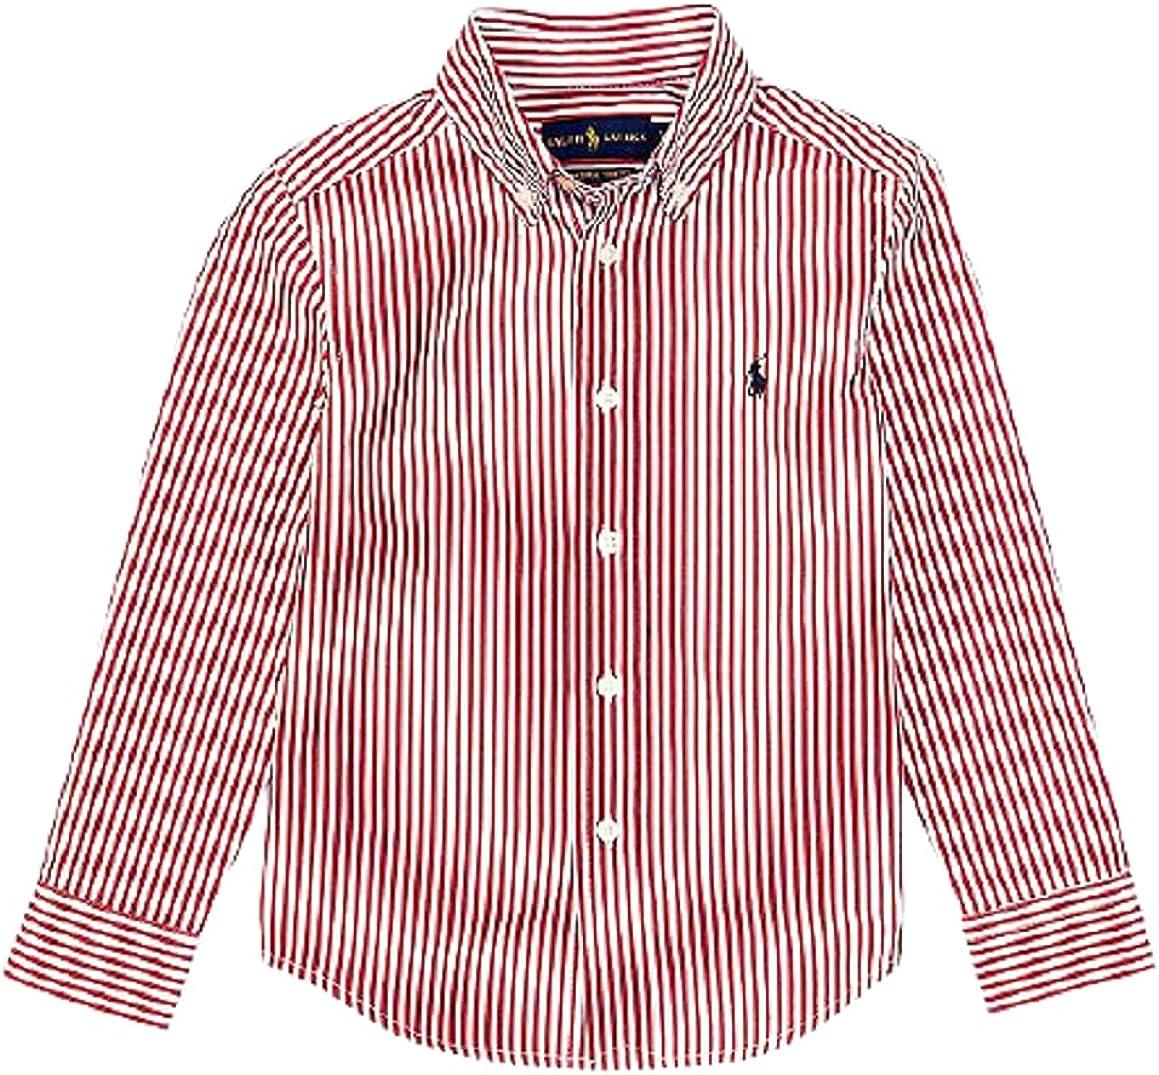 Polo Ralph Lauren Evening Post RED Boys Striped